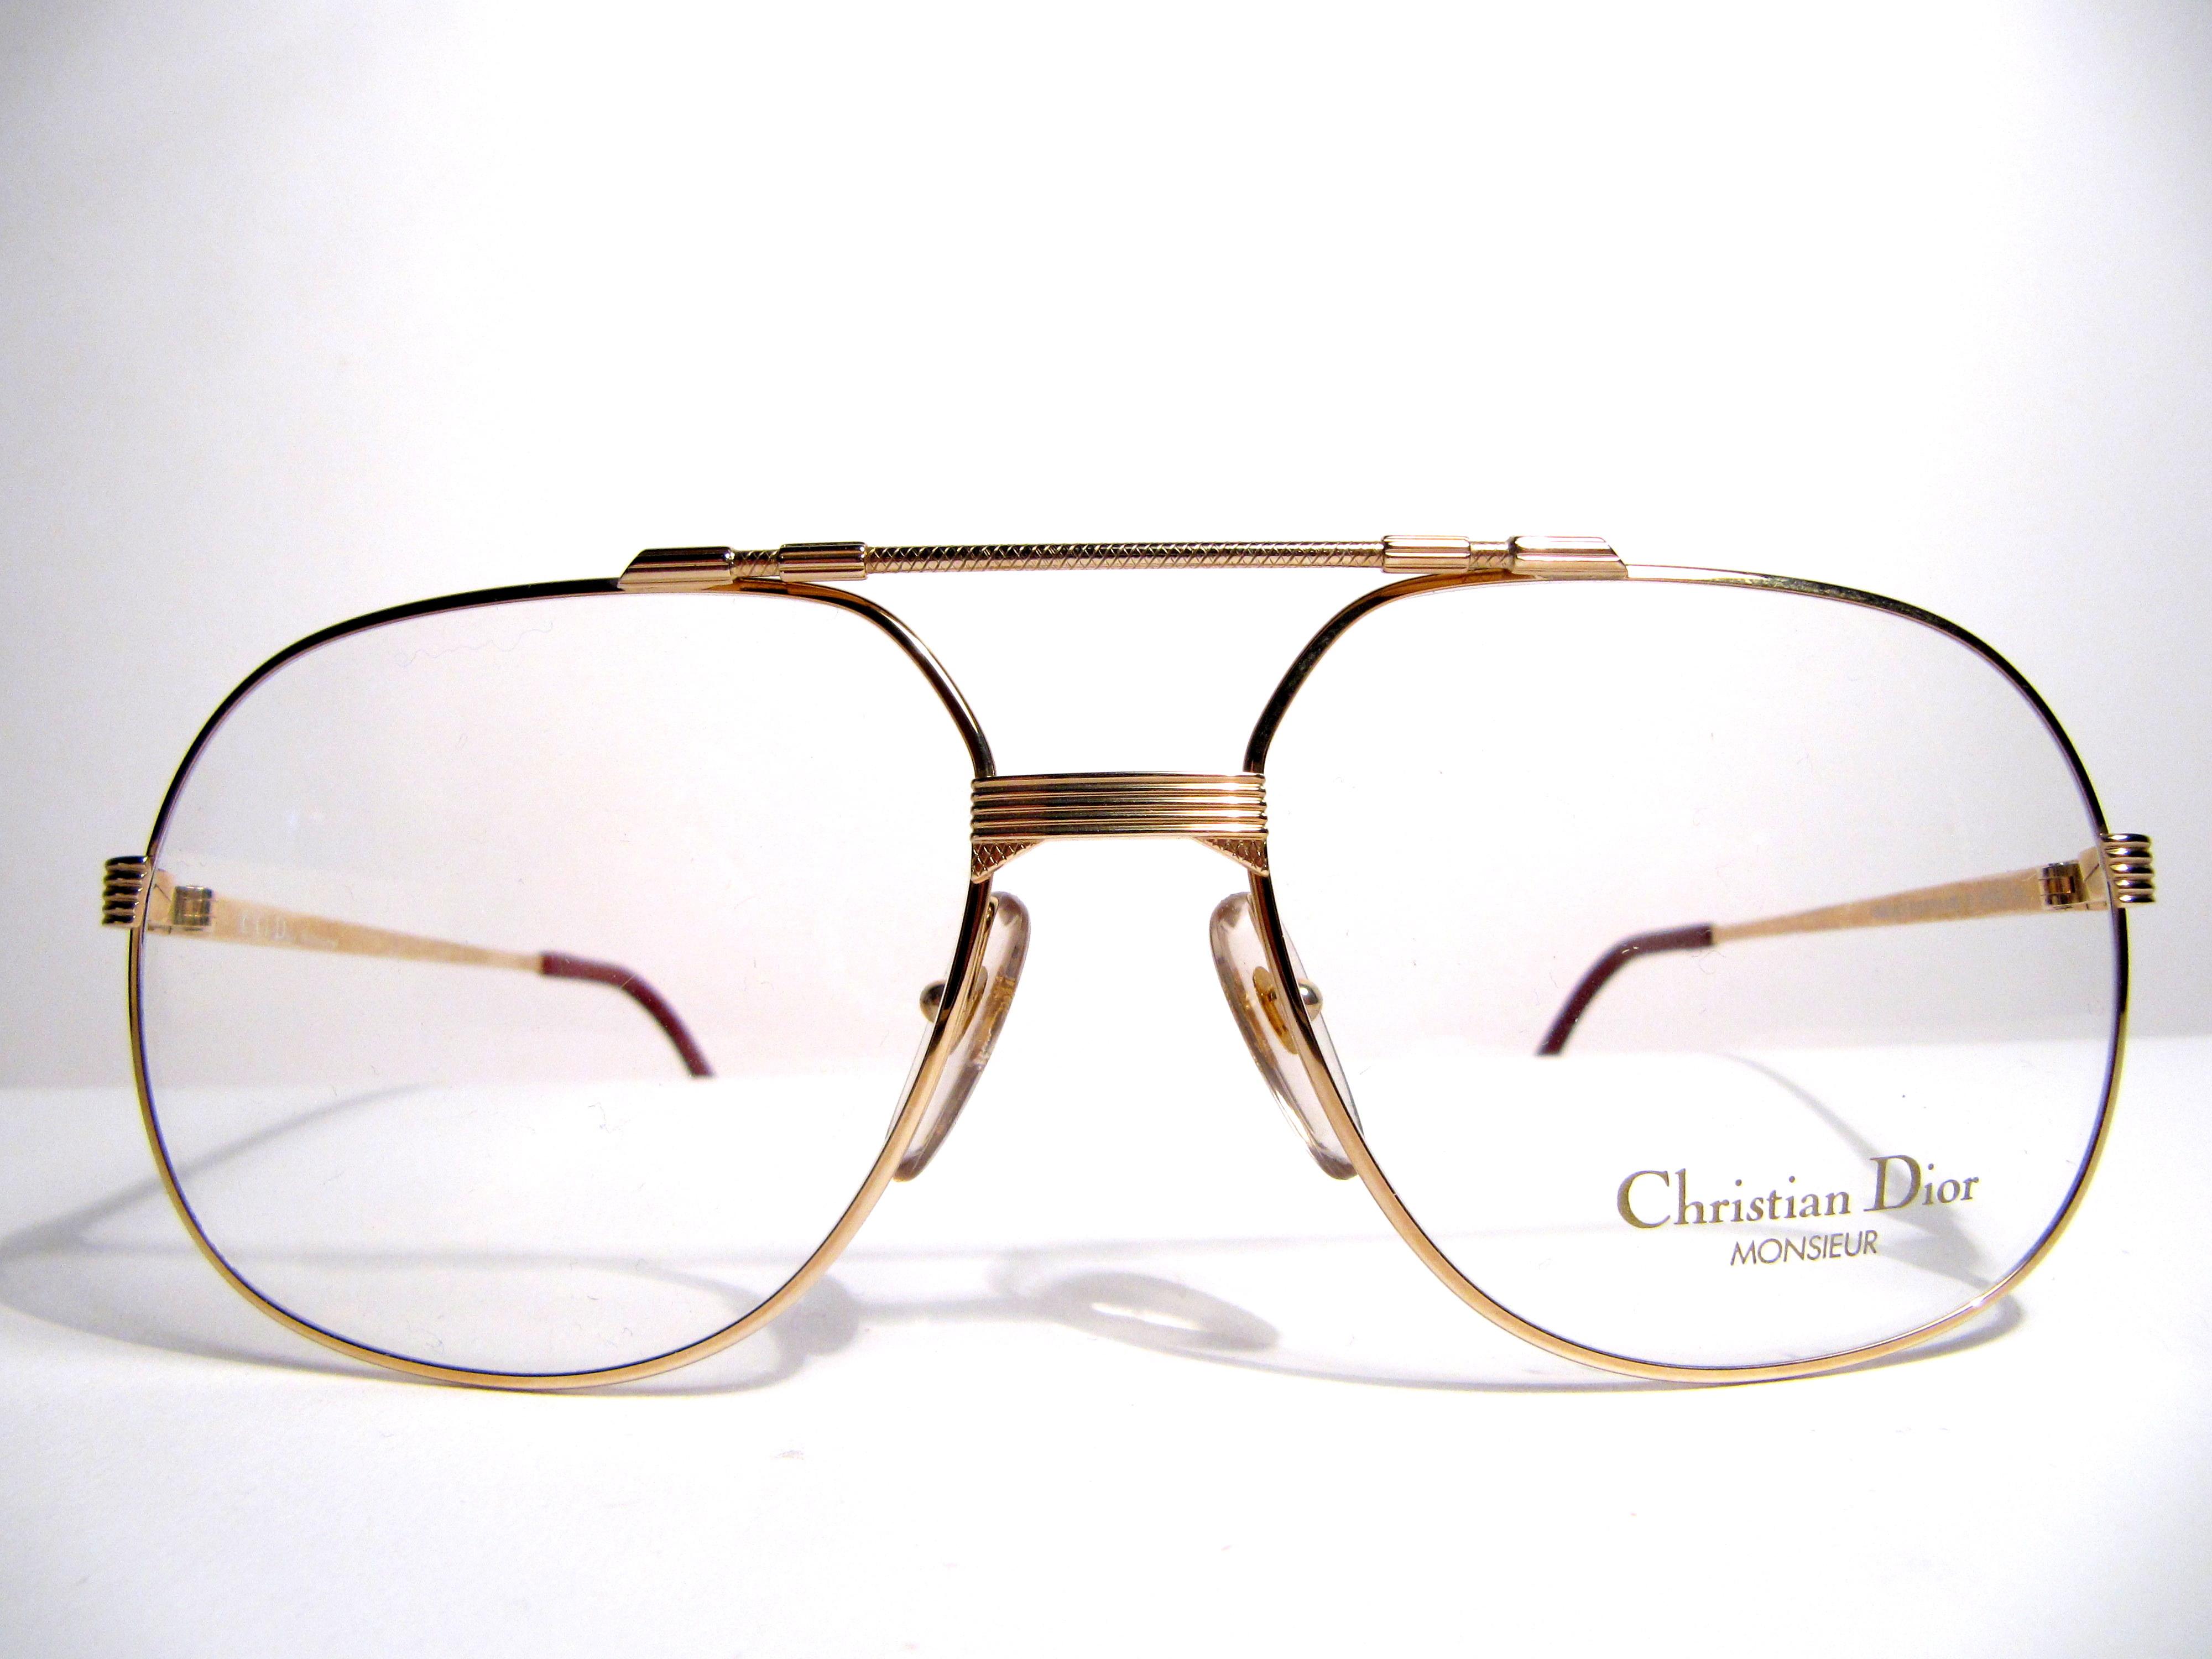 Vintage Eyeglass Frames Maine : Christian Dior 2487 monsieur